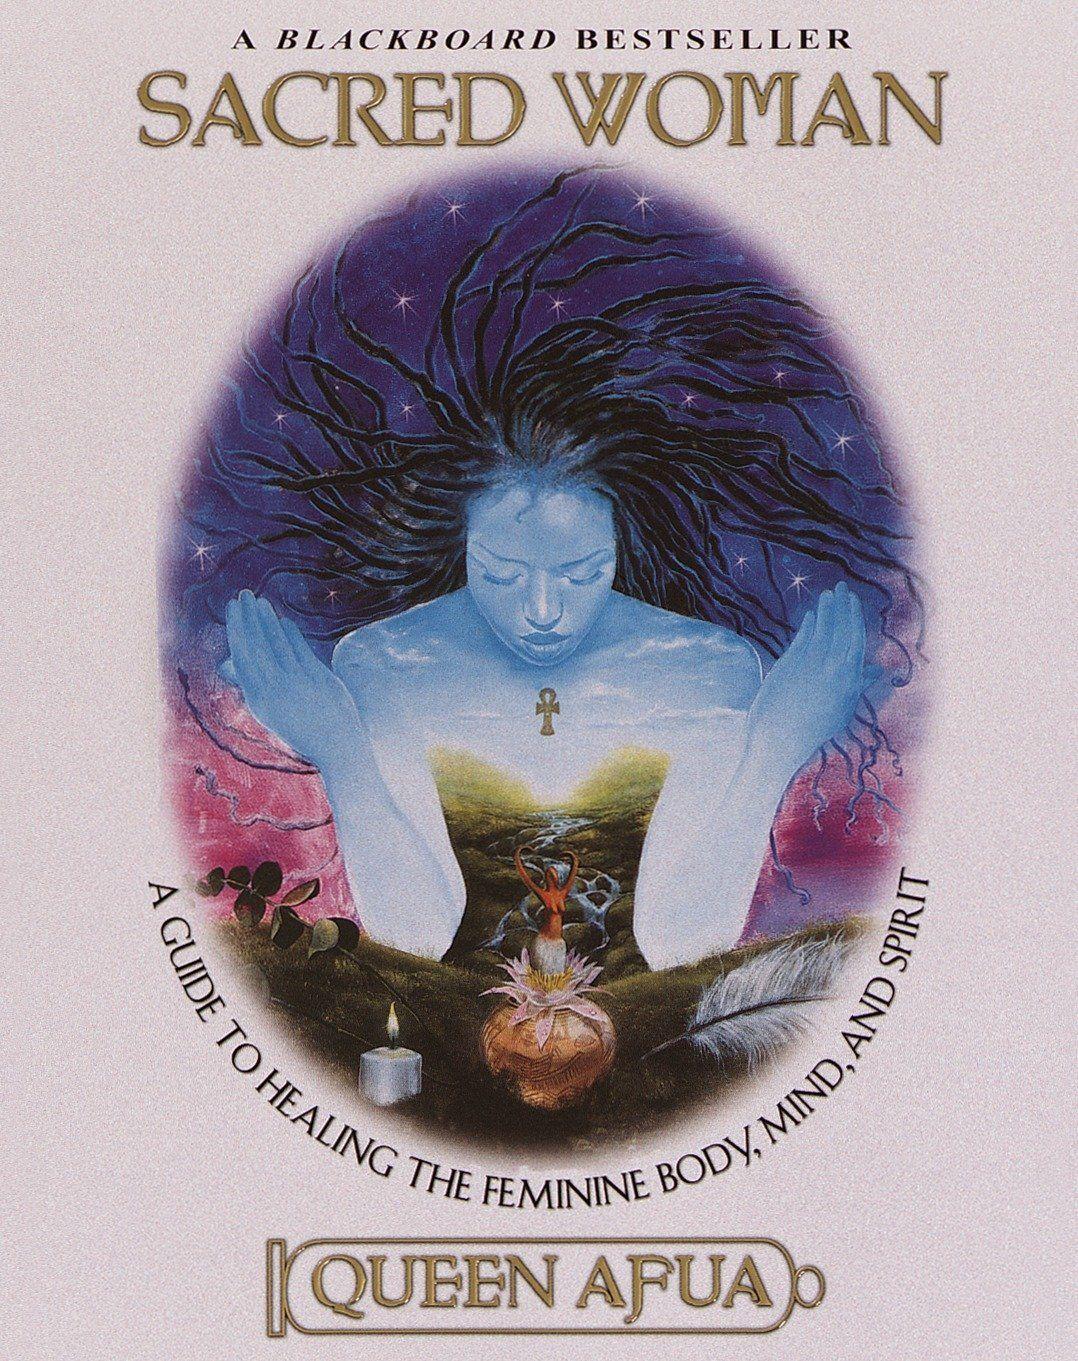 Queen Afua Best full download books: #Health #Fitness #Dieting #novel #booksnovel #booksdrama #books...